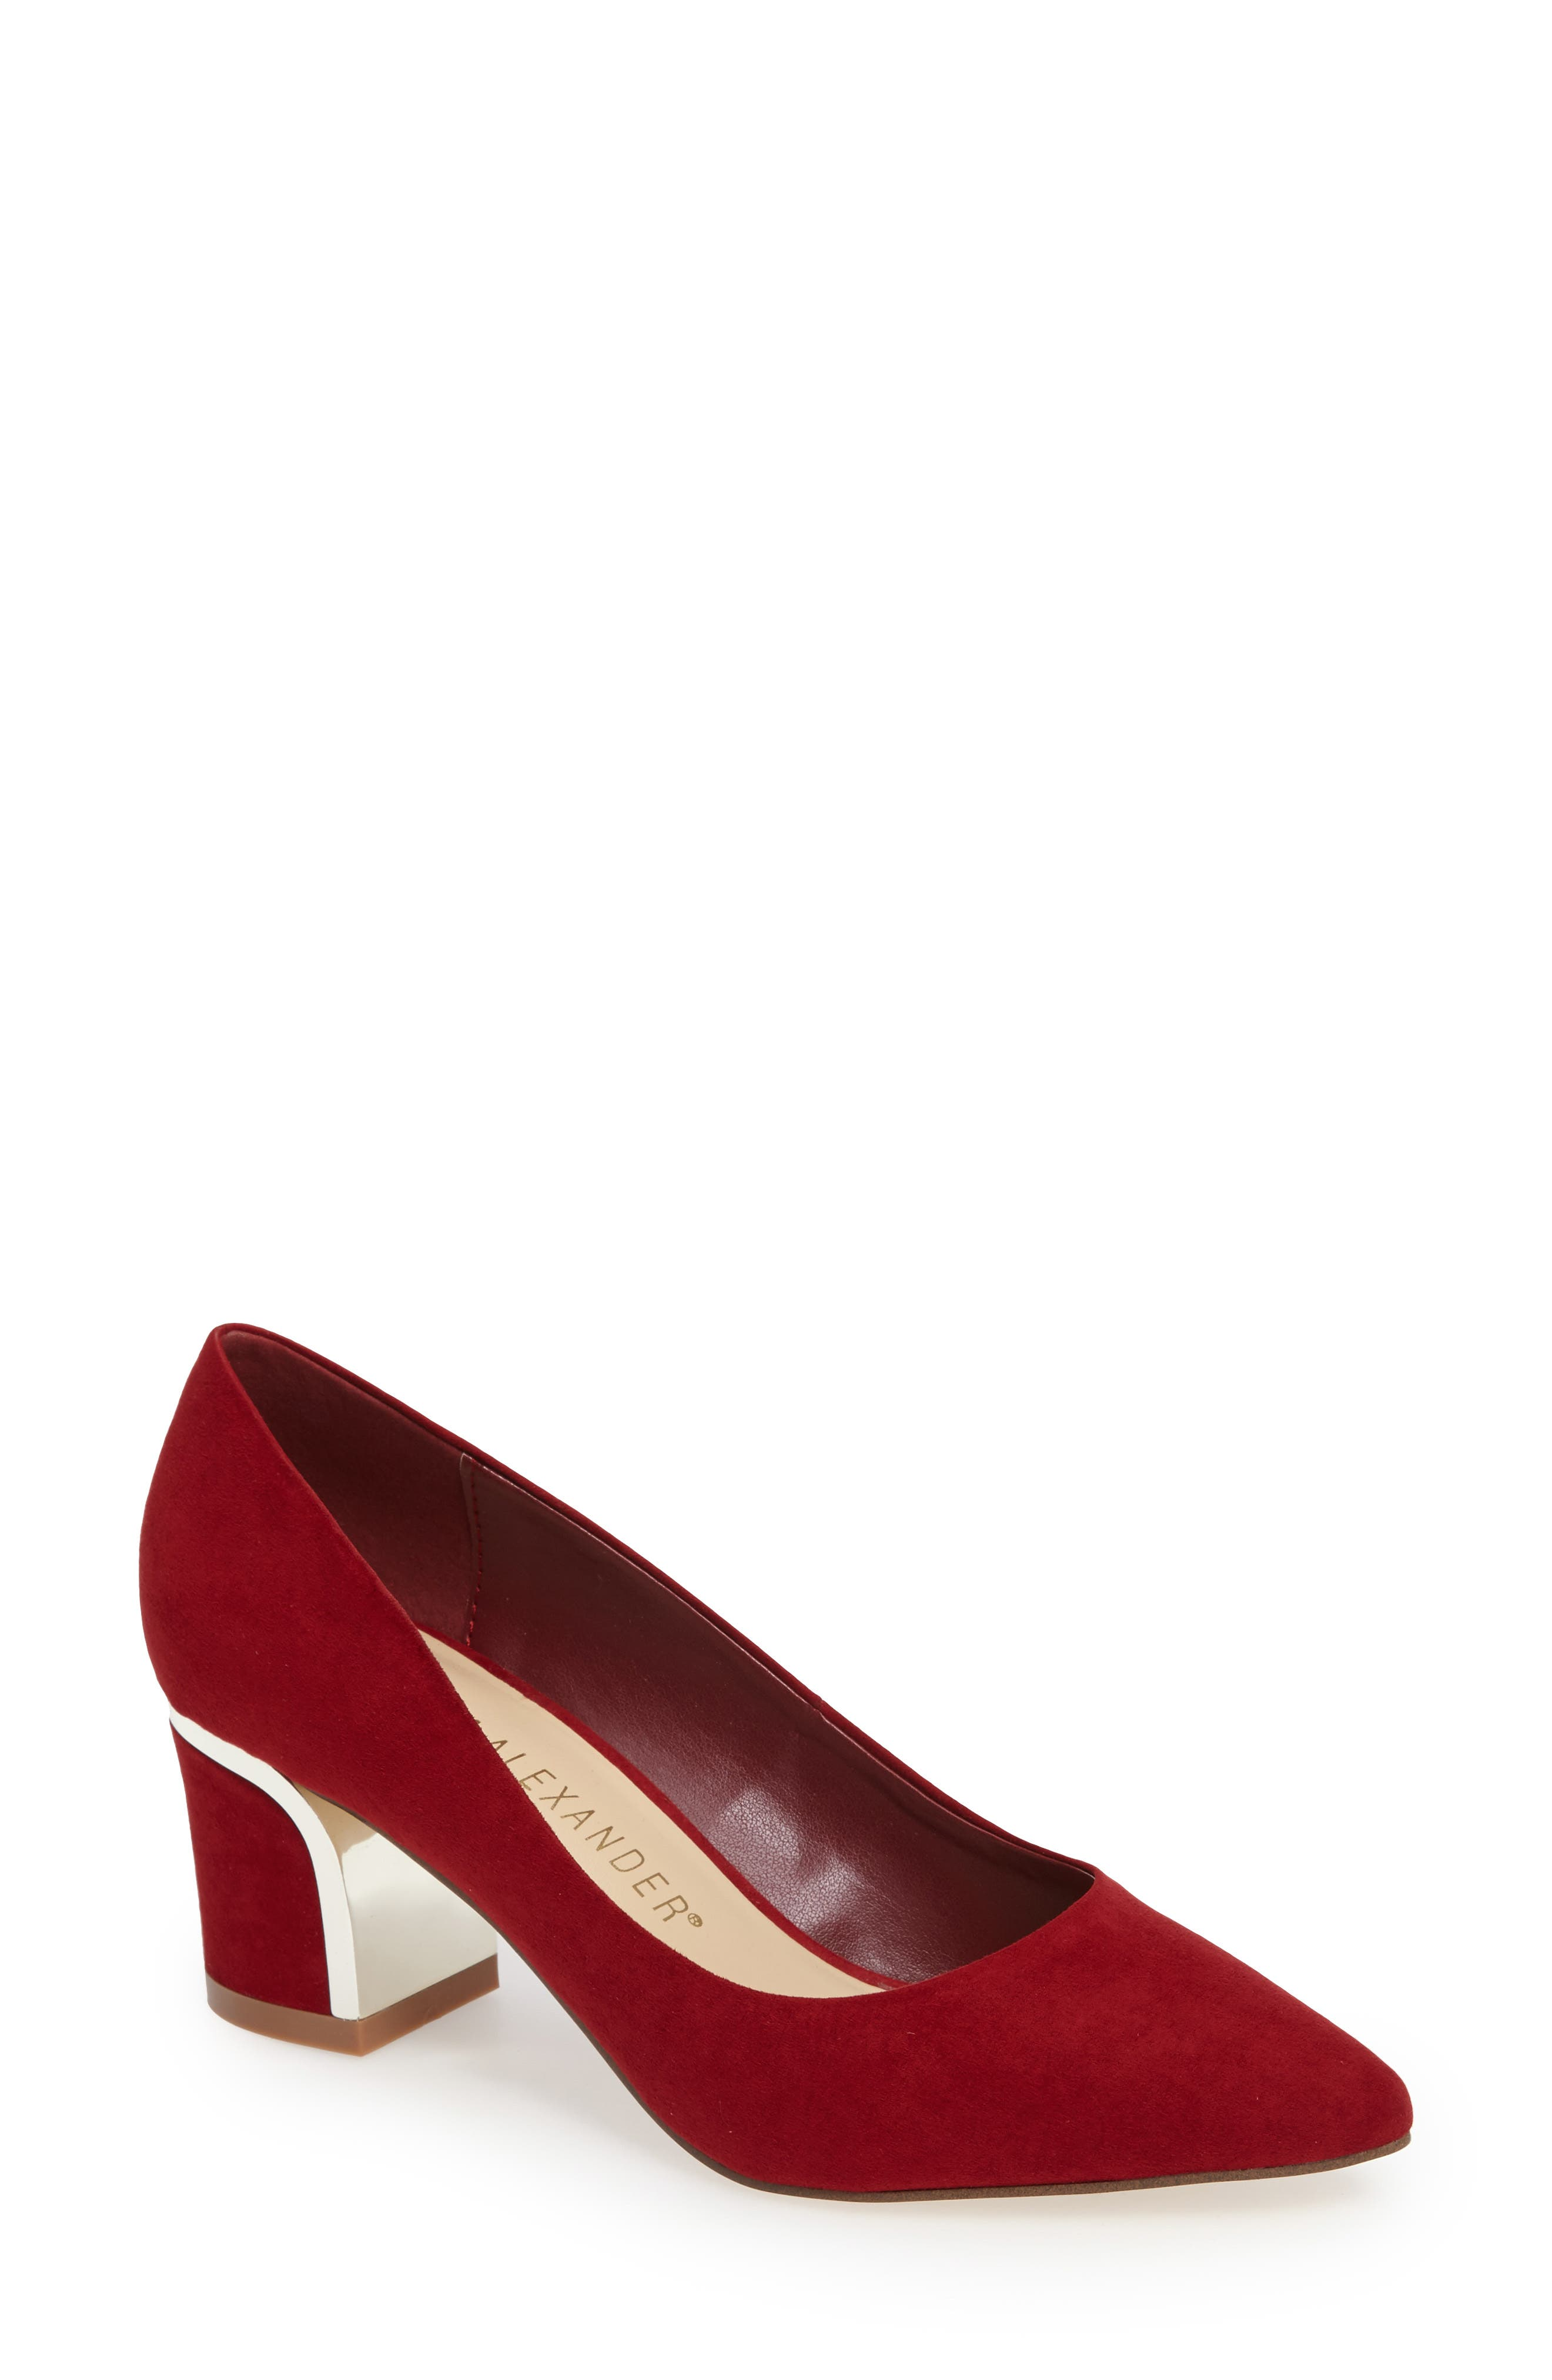 Alternate Image 1 Selected - Athena Alexander Zabel Embellished Block Heel Pump (Women)